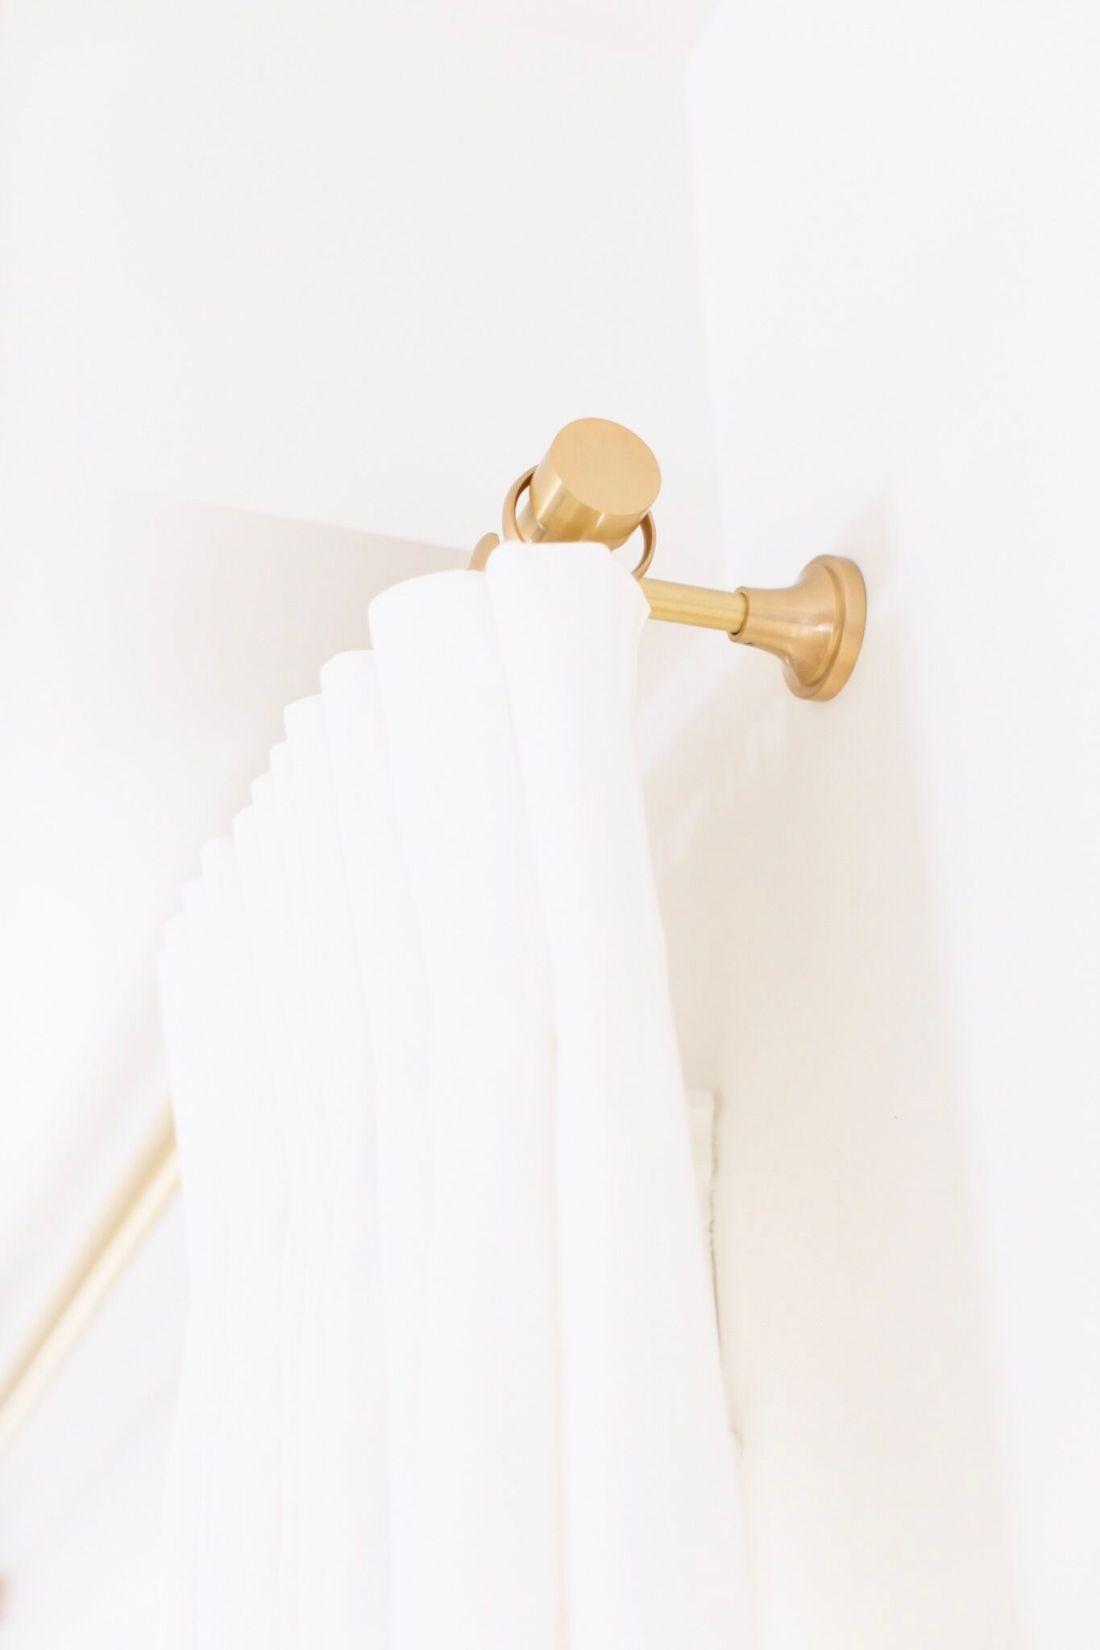 Gold Hardware for White linen drapes from Q design centre